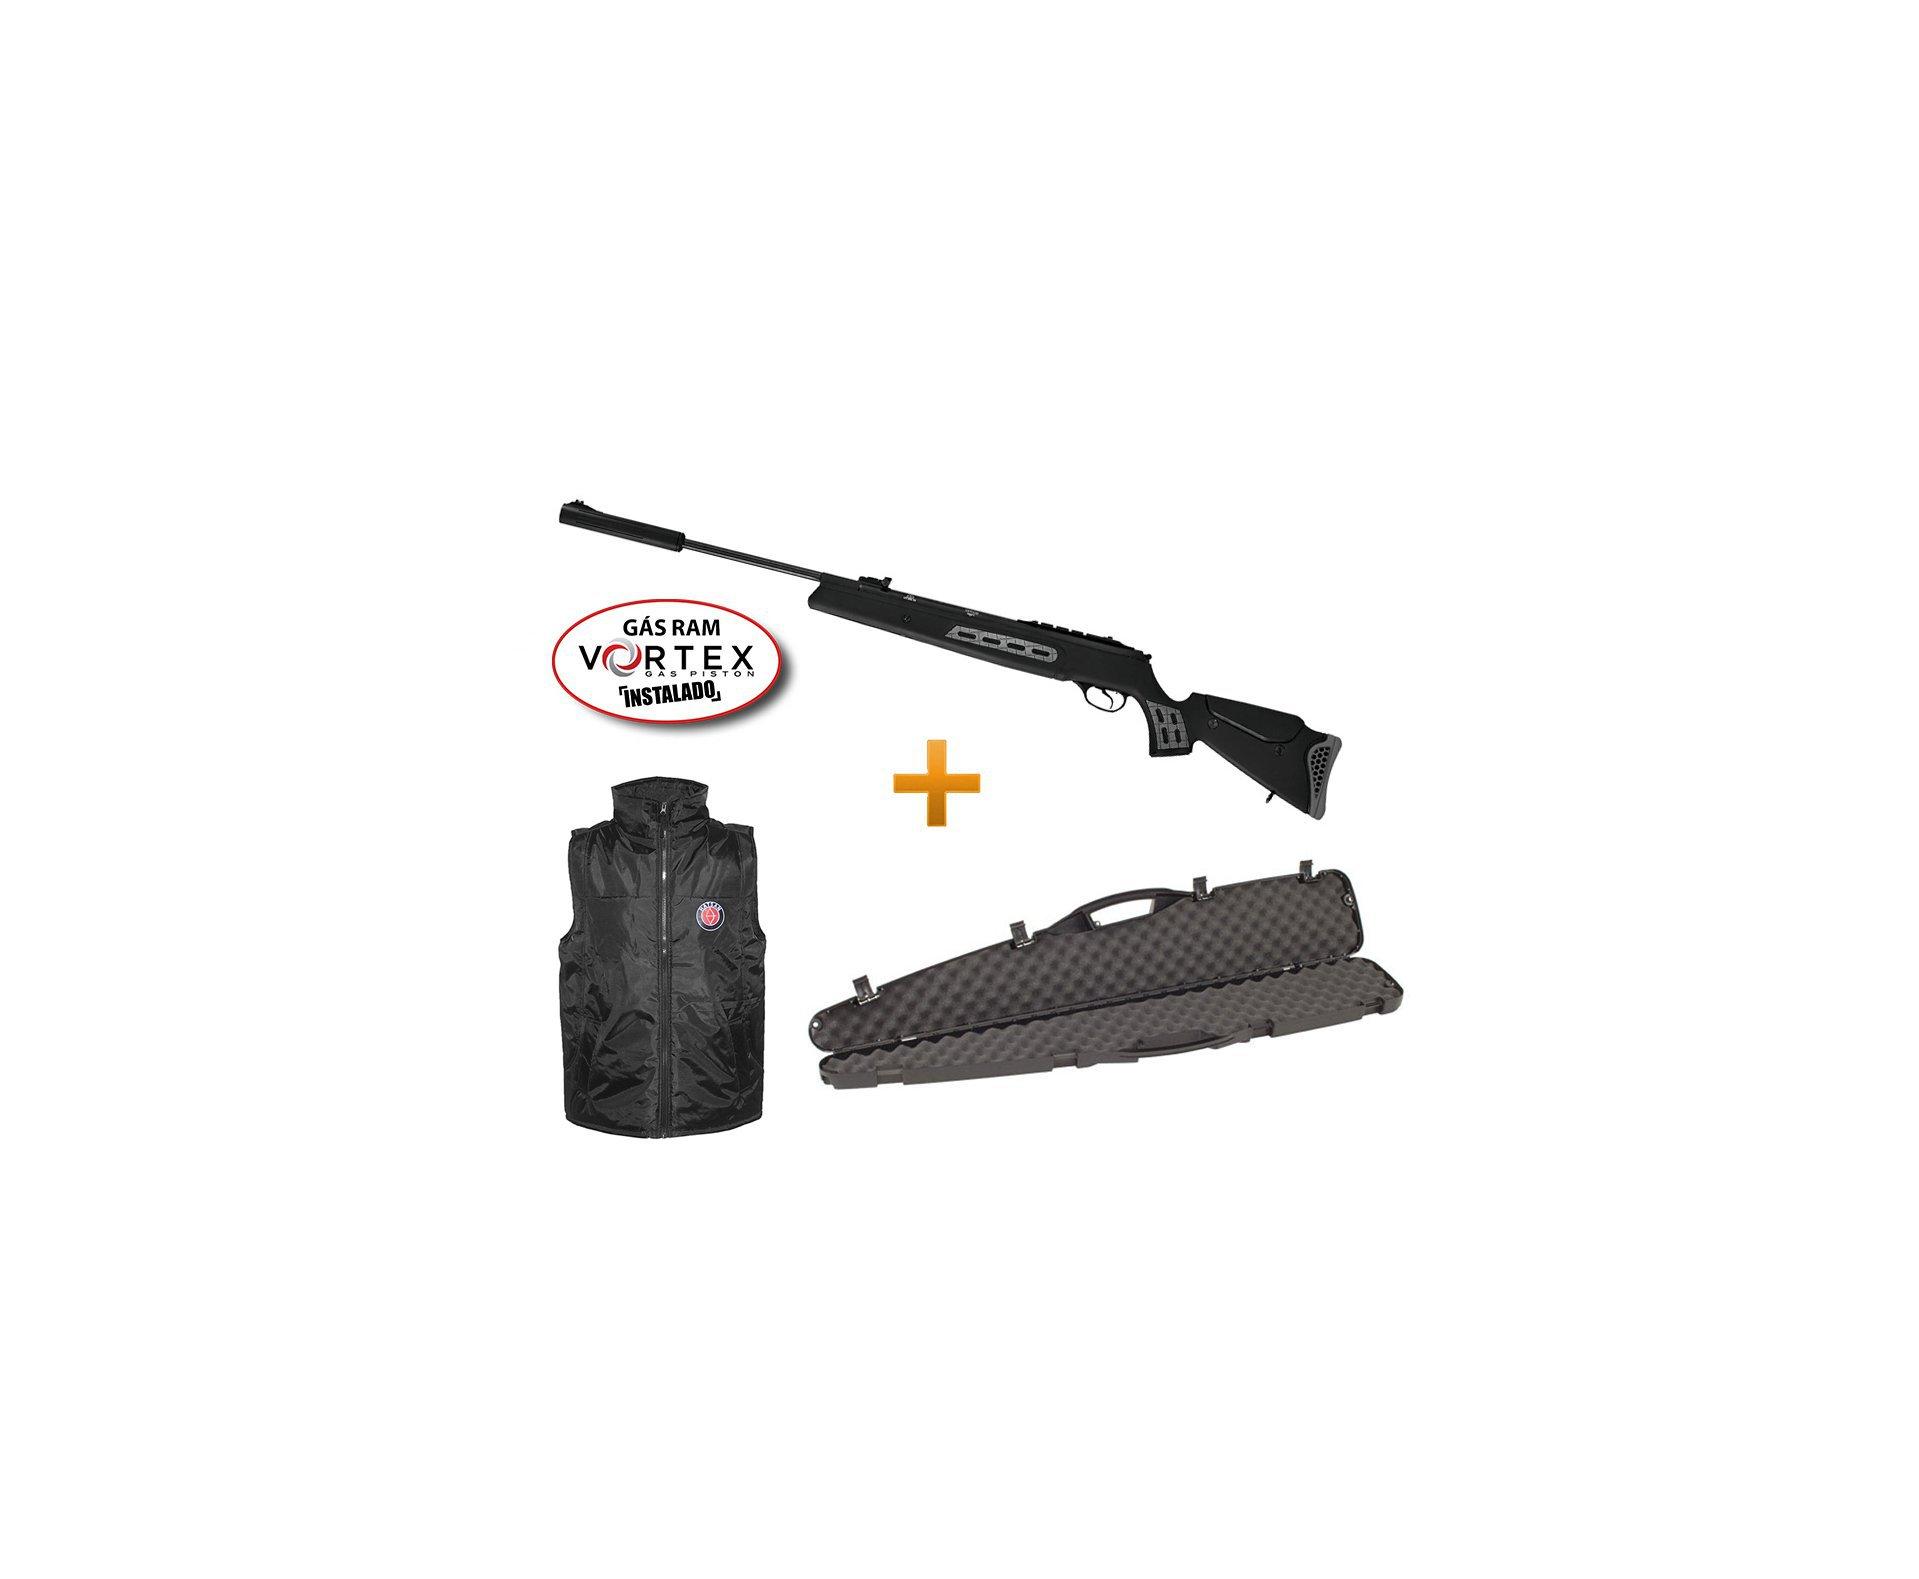 Carabina De Pressão Hatsan Ht 125 Sniper Vortex Gas Ram 75kg 5,5 Mm + Case + Colete Hatsan - Hatsan